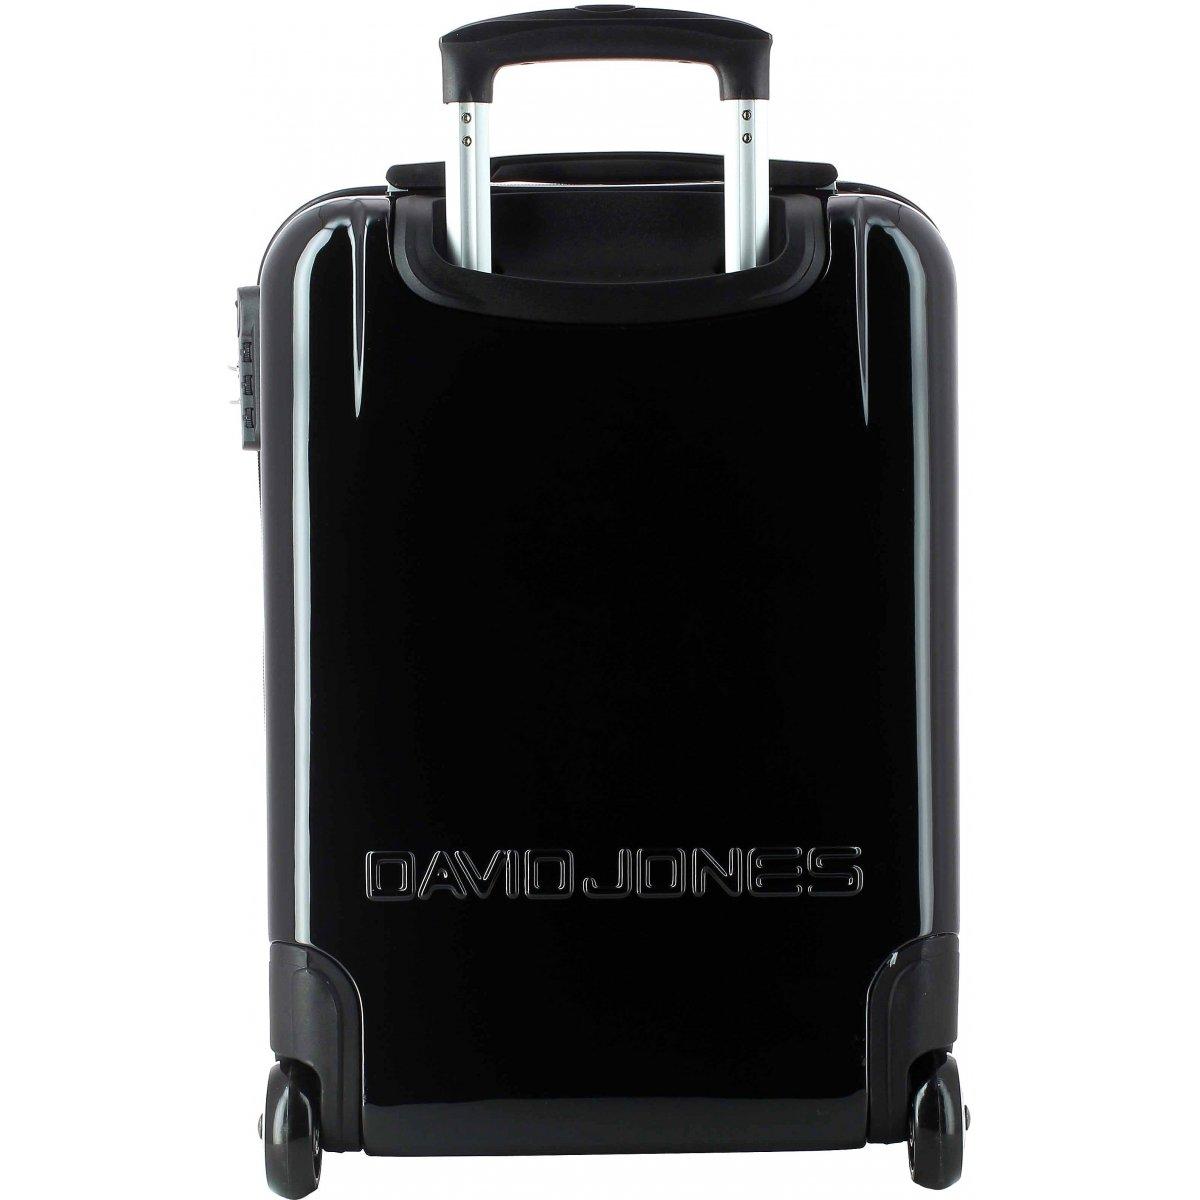 valise cabine ryanair david jones ba2021 couleur principale affichage aeroport promotion. Black Bedroom Furniture Sets. Home Design Ideas